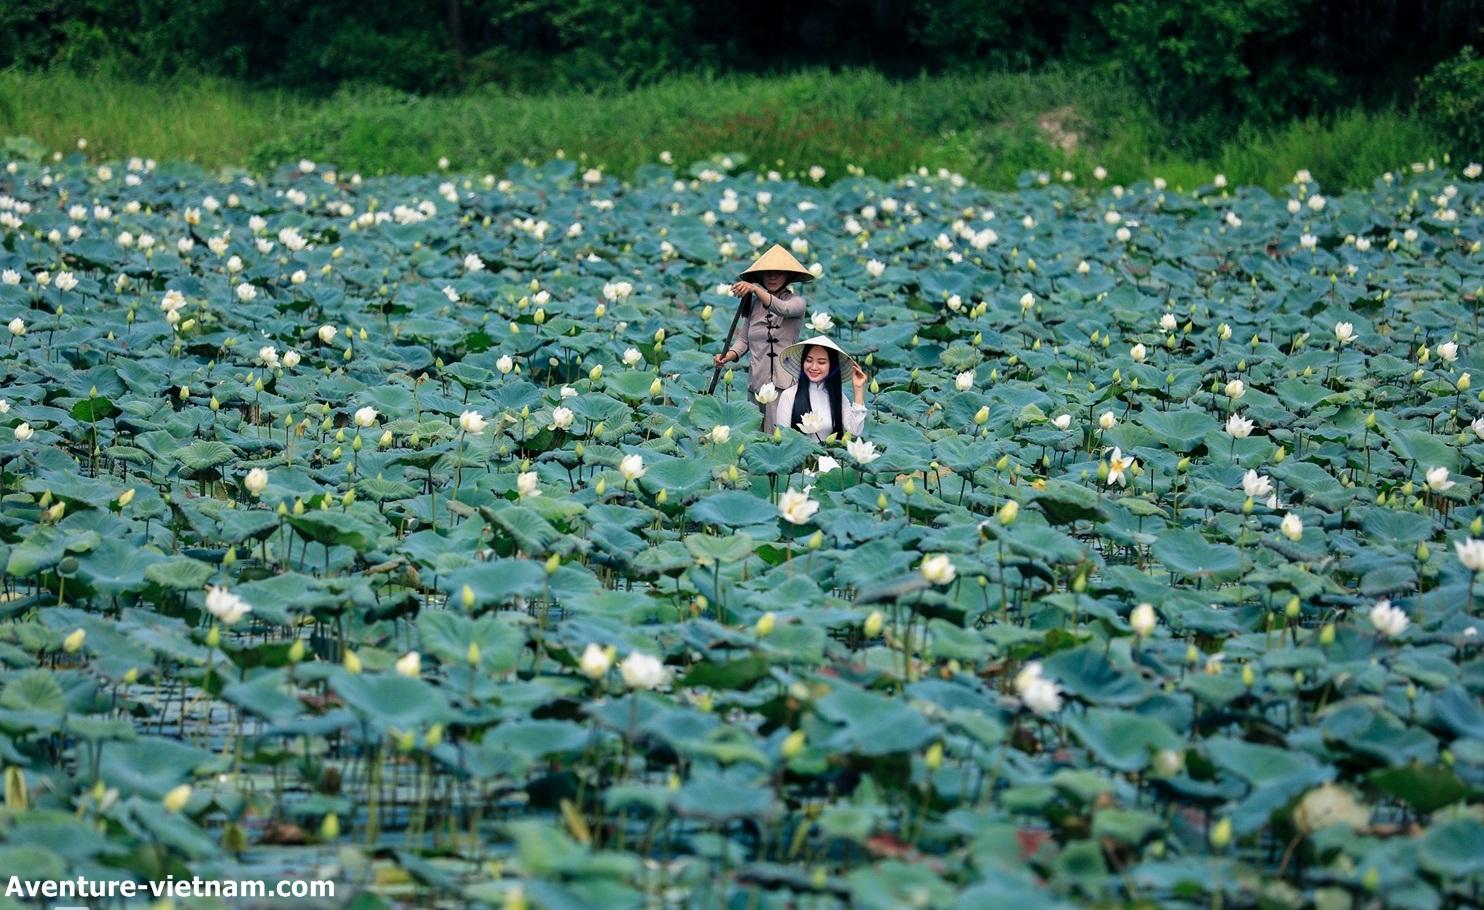 voyage-sur-mesure-vietnam